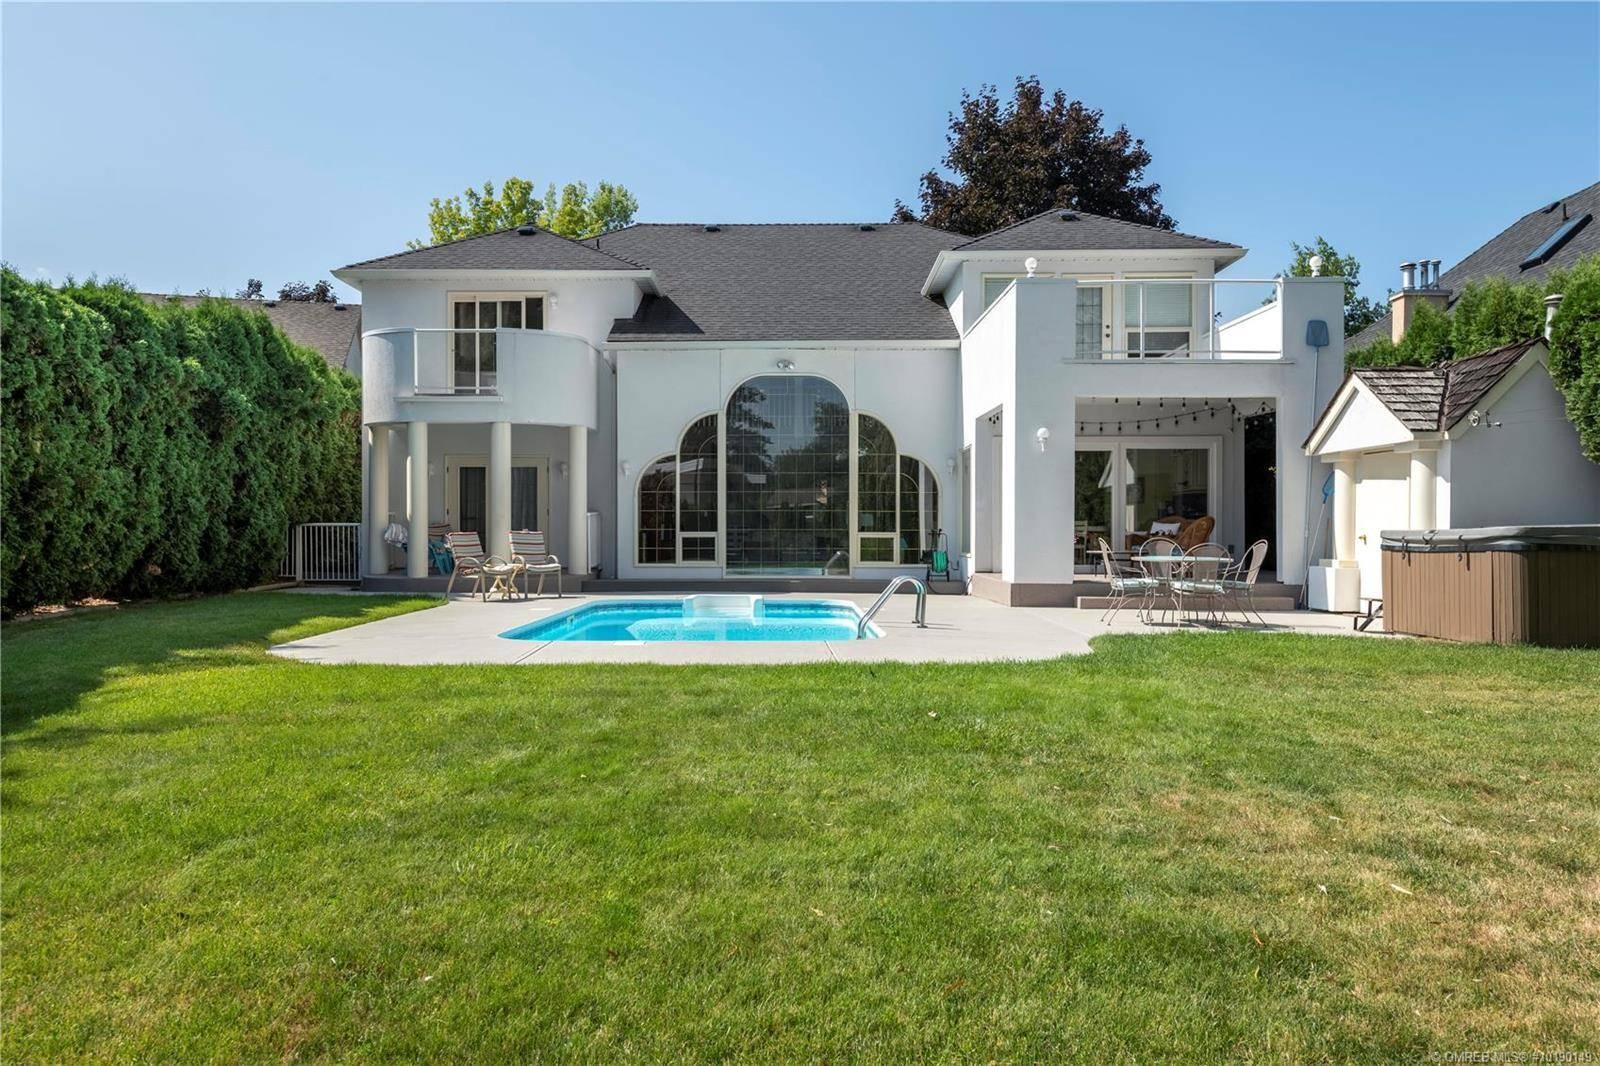 House for sale at 462 Carona Cres Kelowna British Columbia - MLS: 10190149